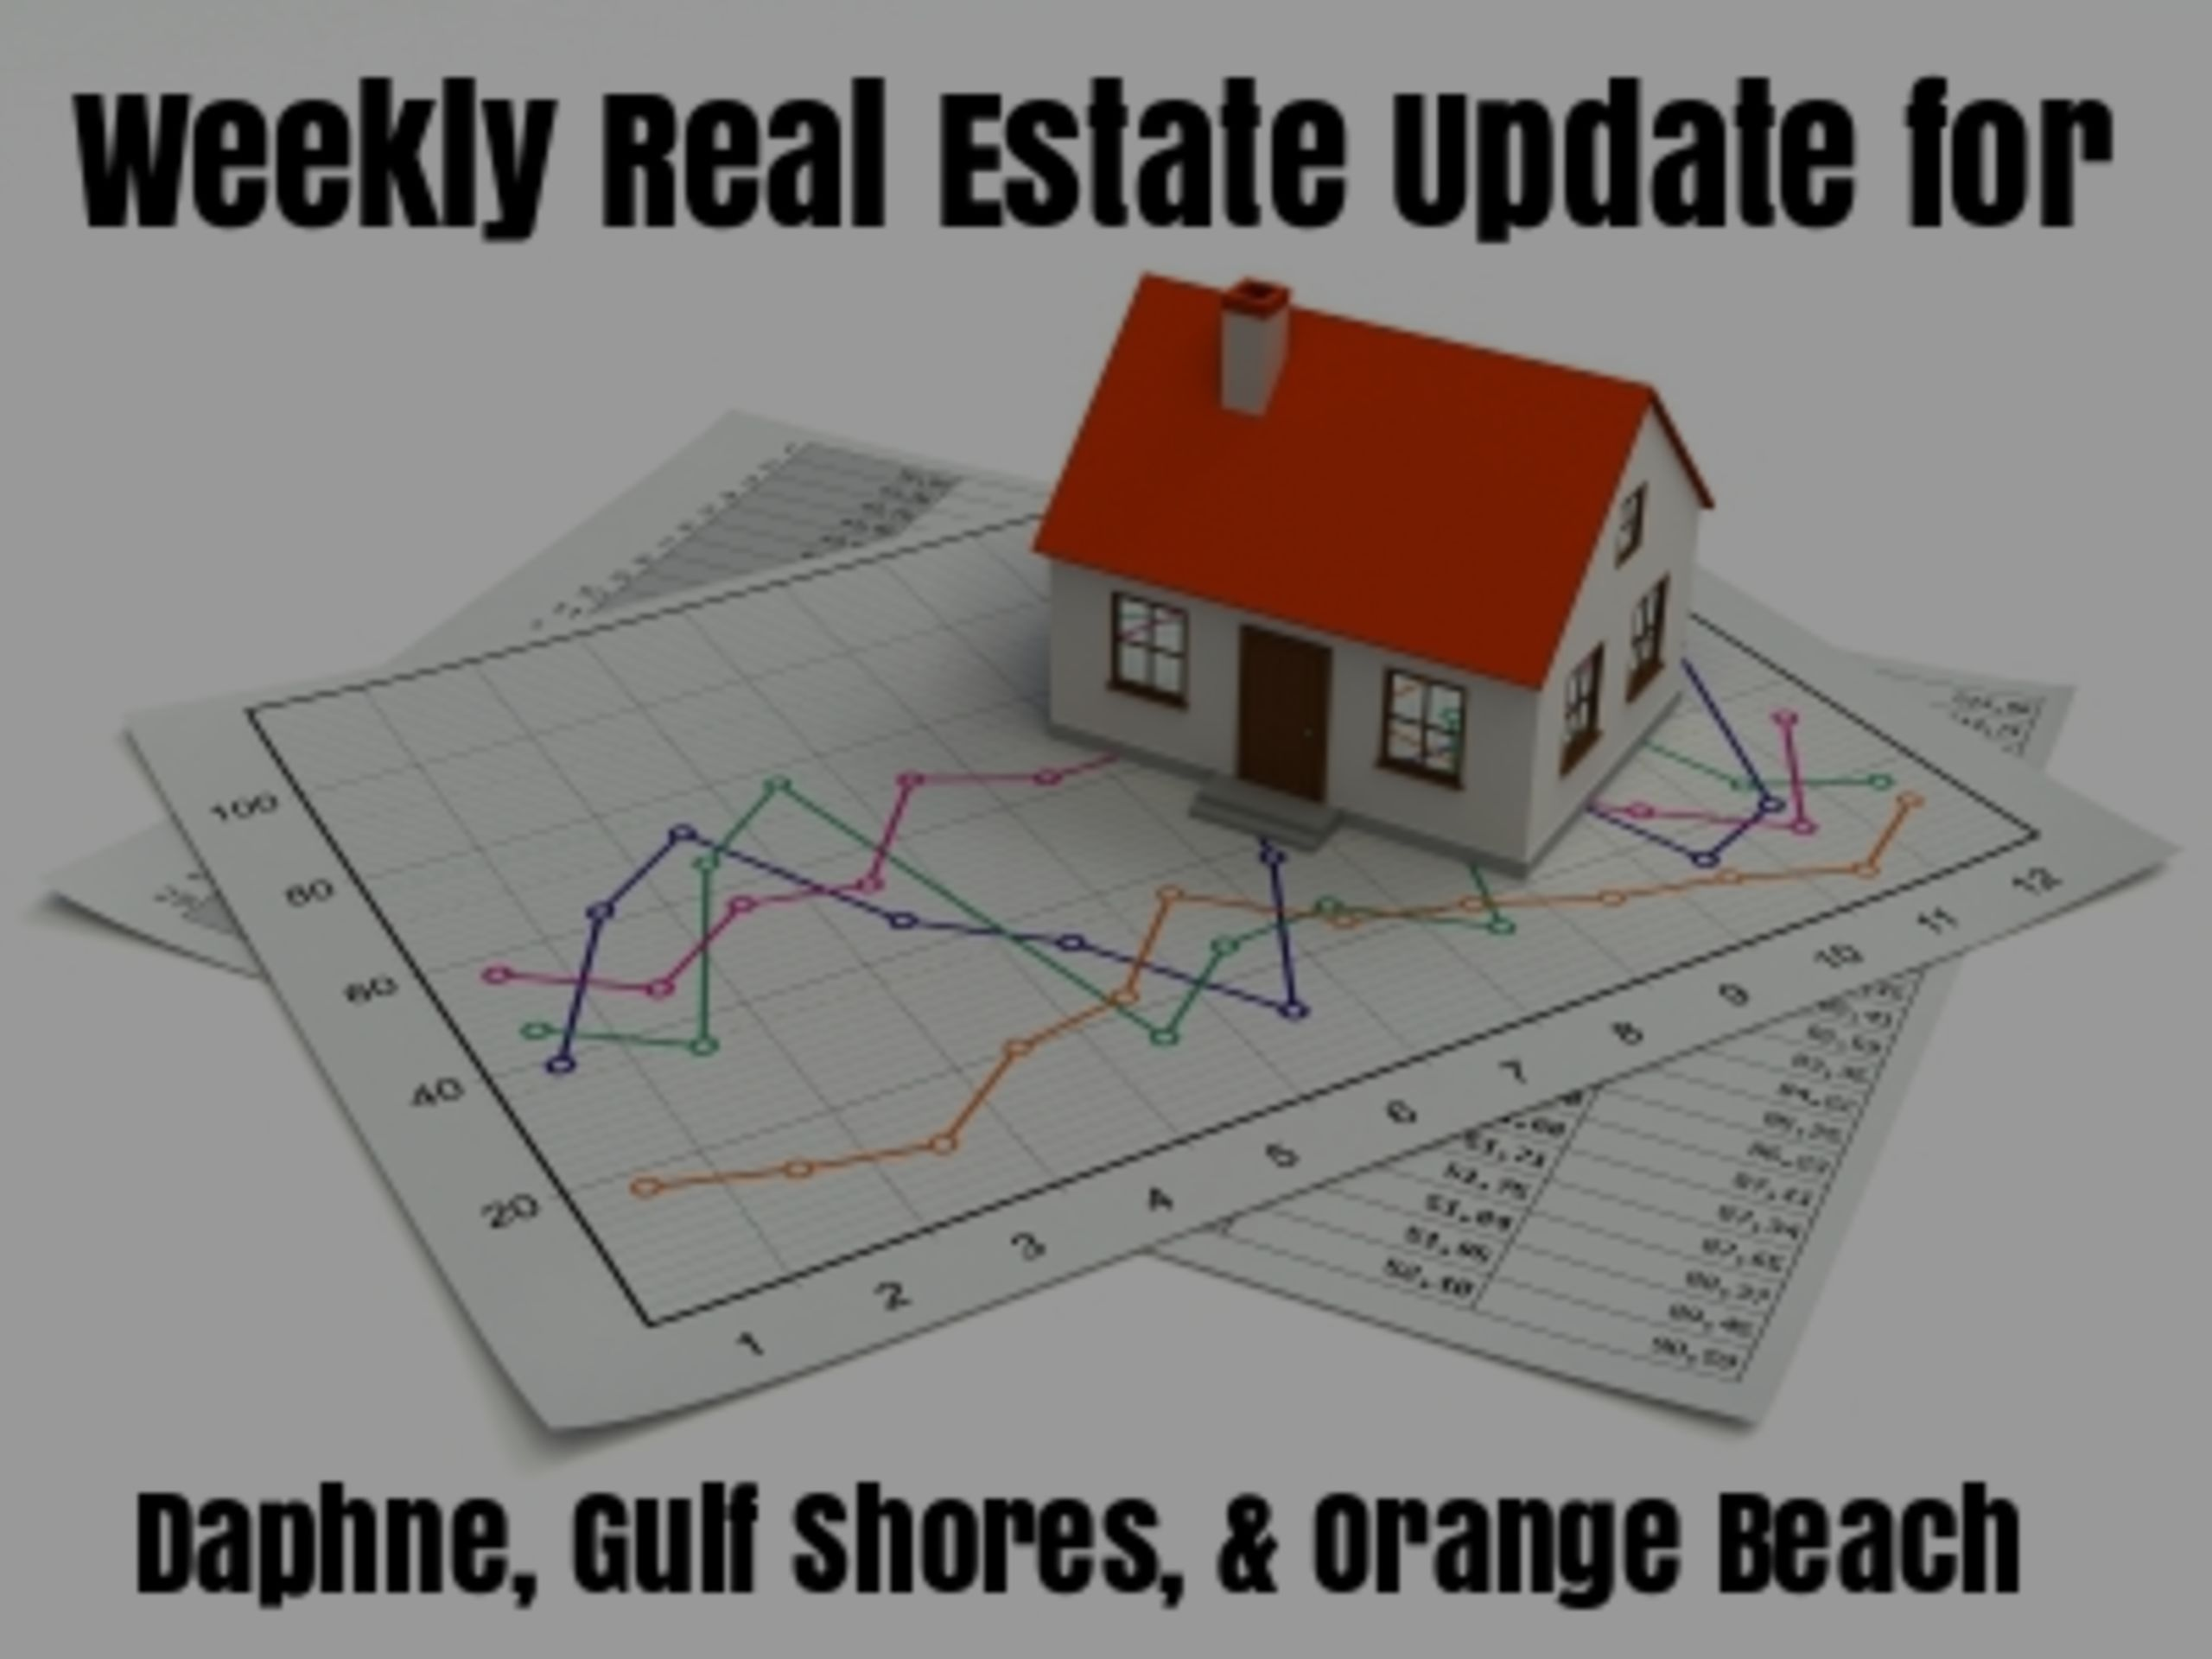 Weekly Real Estate Update – Daphne, Gulf Shores, and Orange Beach – 4/24/17